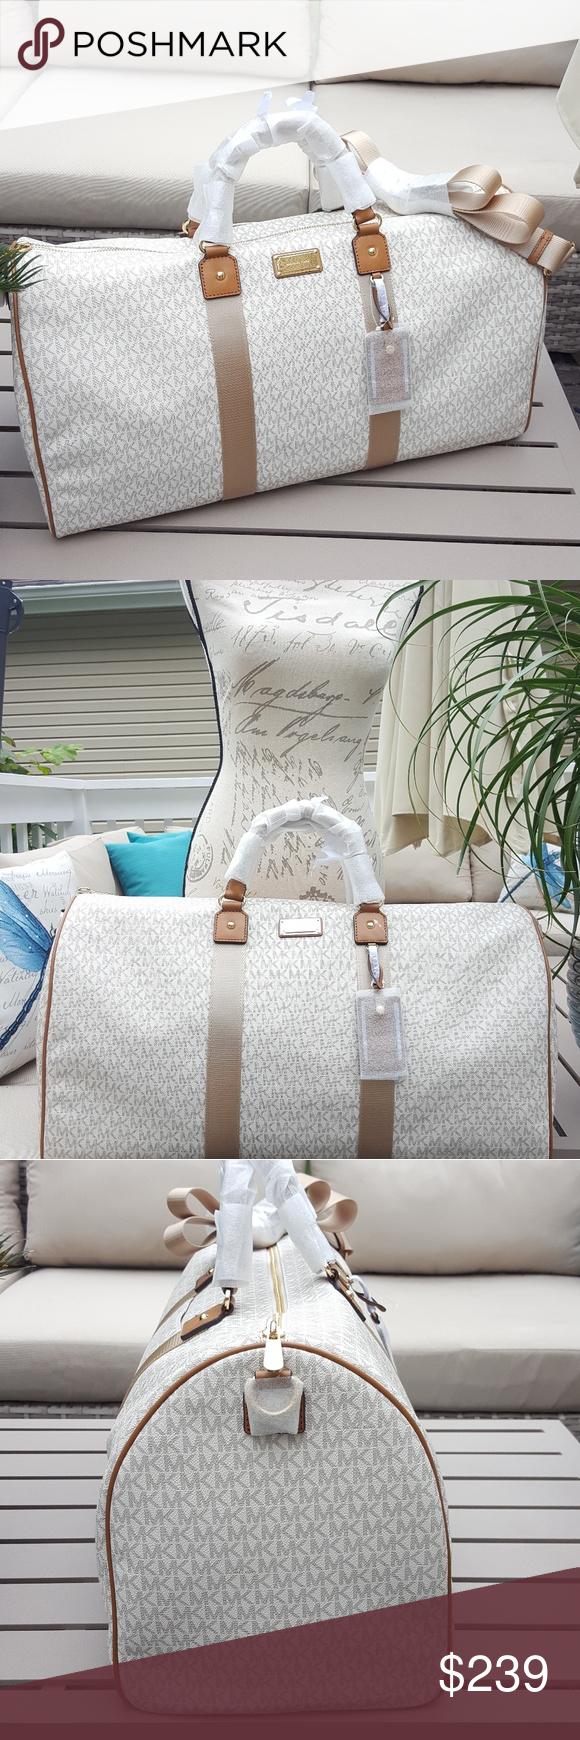 b4c8266bd157 Michael Kors travel duffle bag vanilla weekender 100% guaranteed authentic  NWT Michael Kors large LG